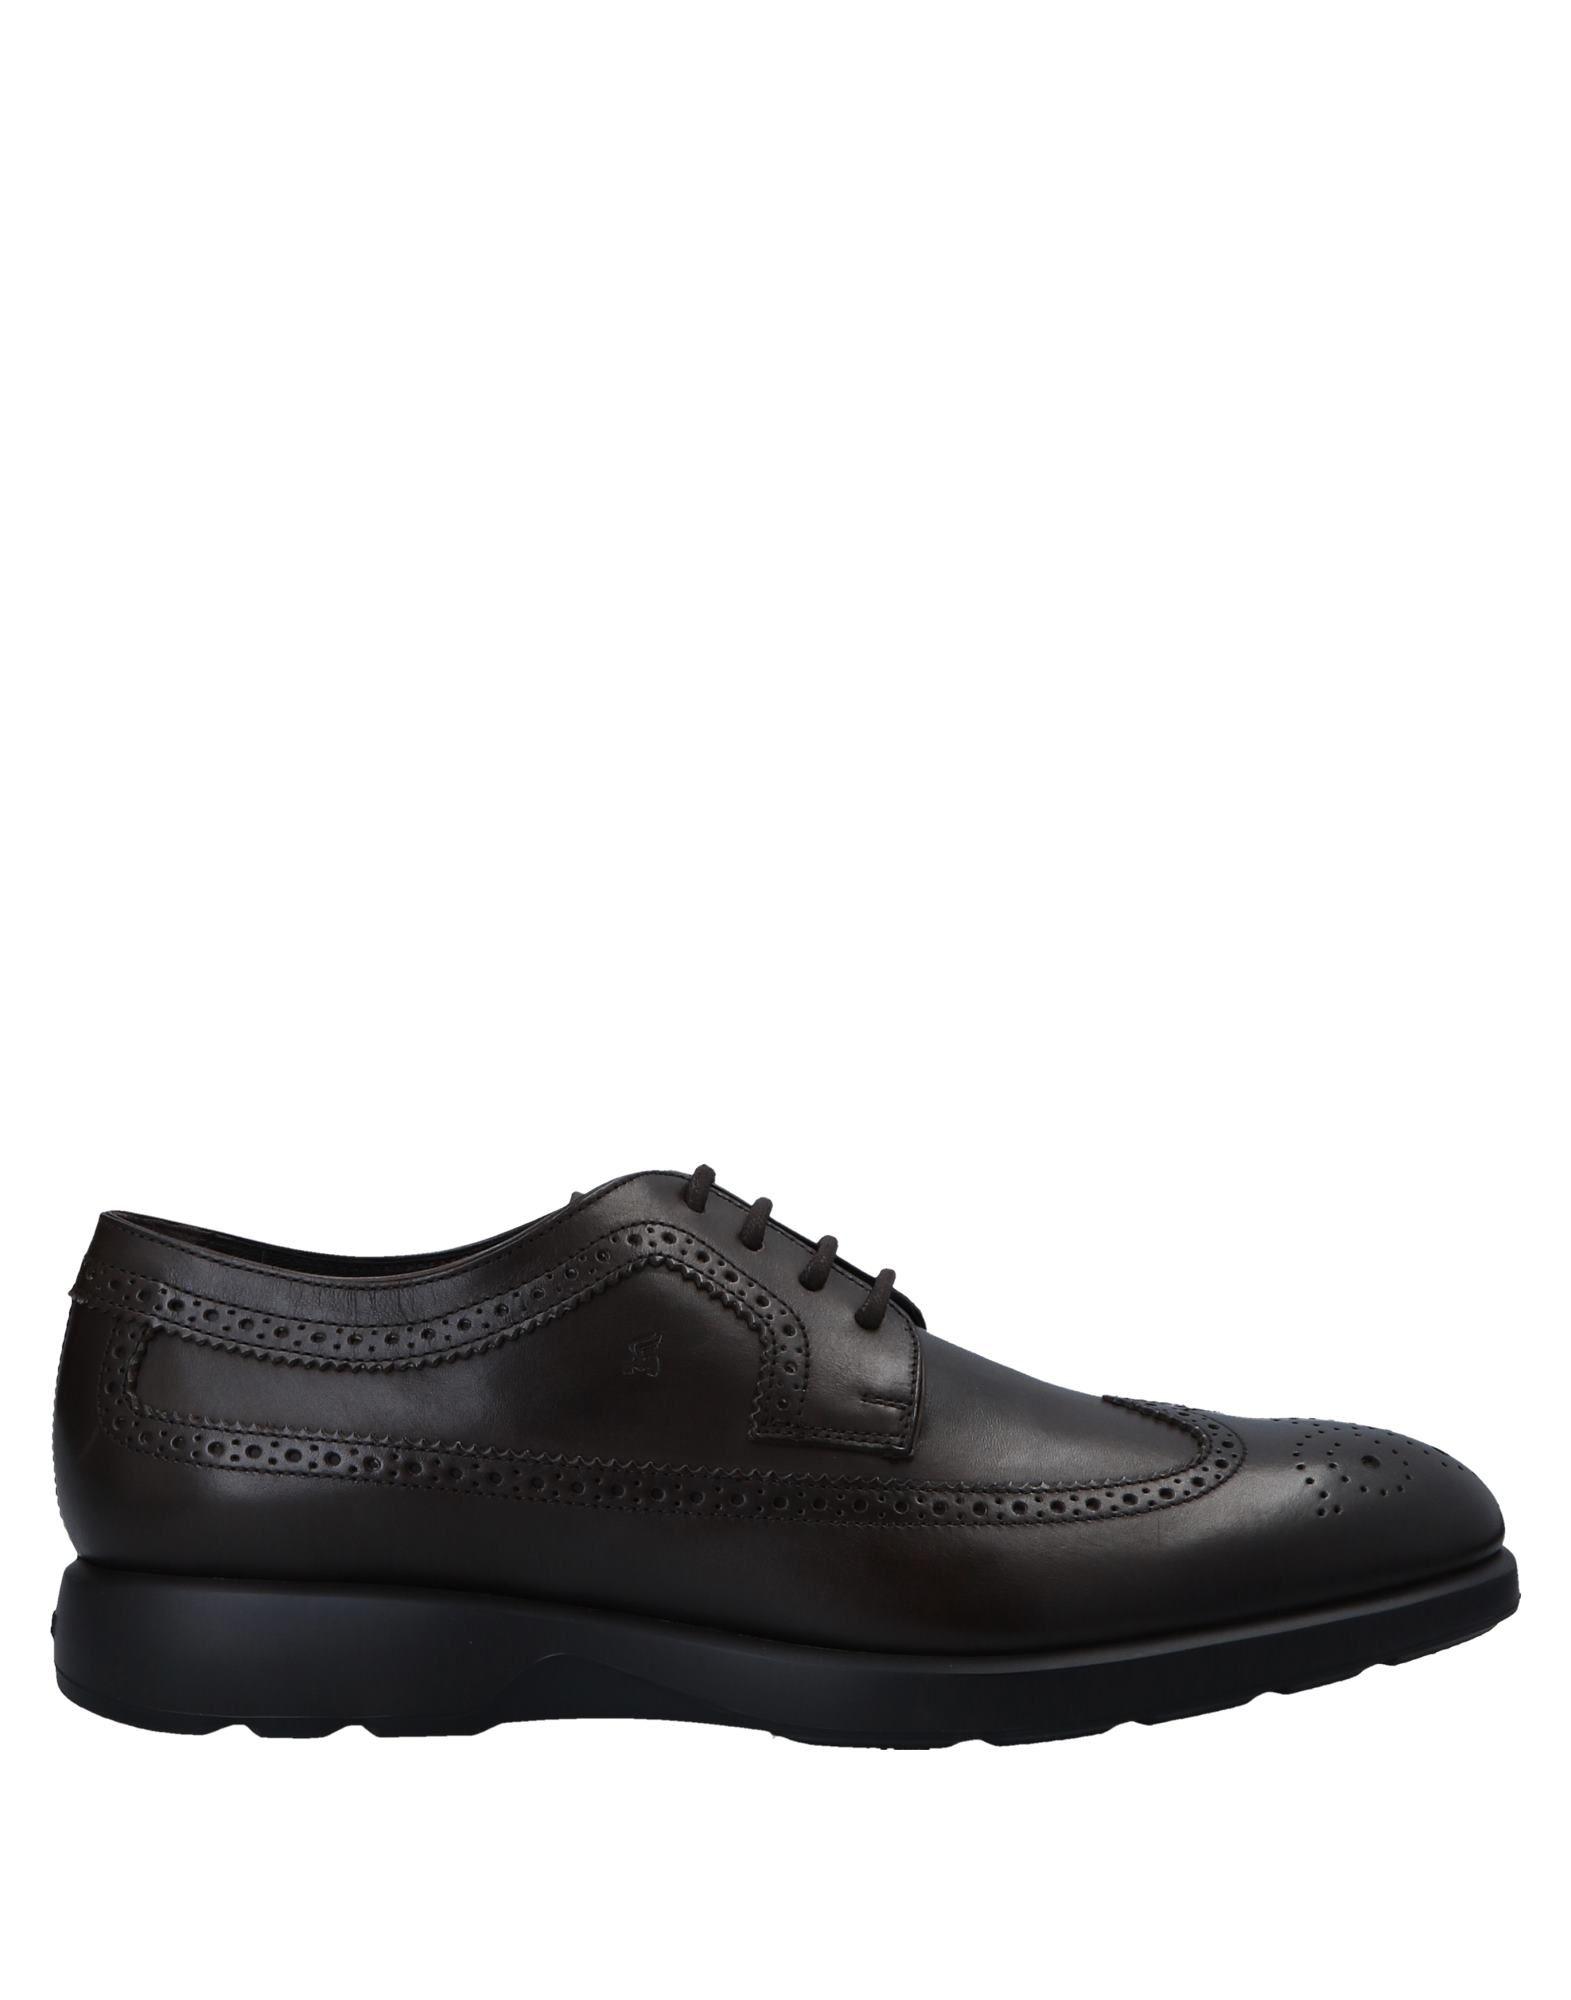 Hogan Schnürschuhe Herren  11559778BS Gute Qualität beliebte Schuhe